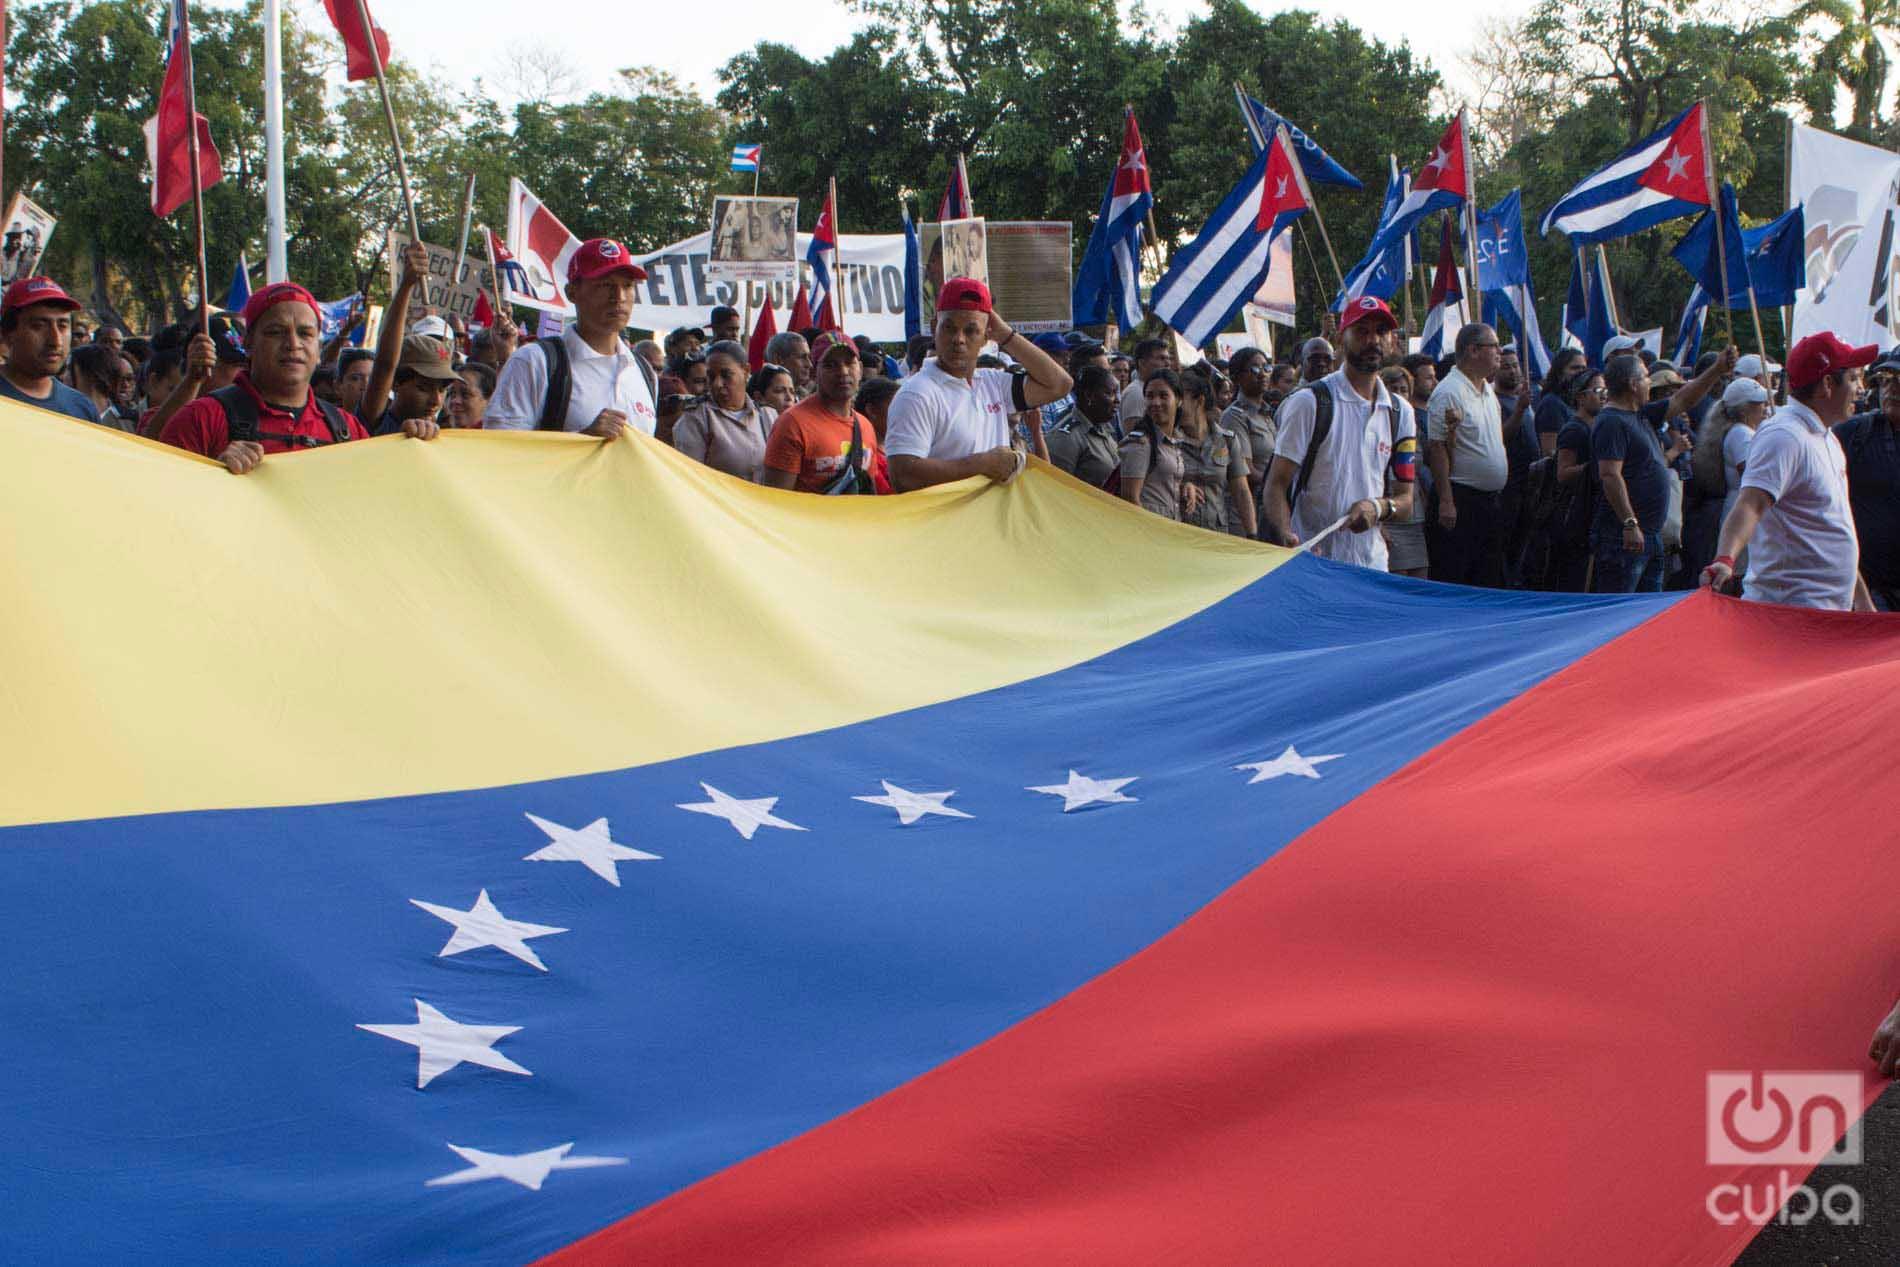 Flag of Venezuela in the International Workers Day parade, on May 1, 2019 in Havana's José Martí Revolution Square. Photo: Otmaro Rodríguez.